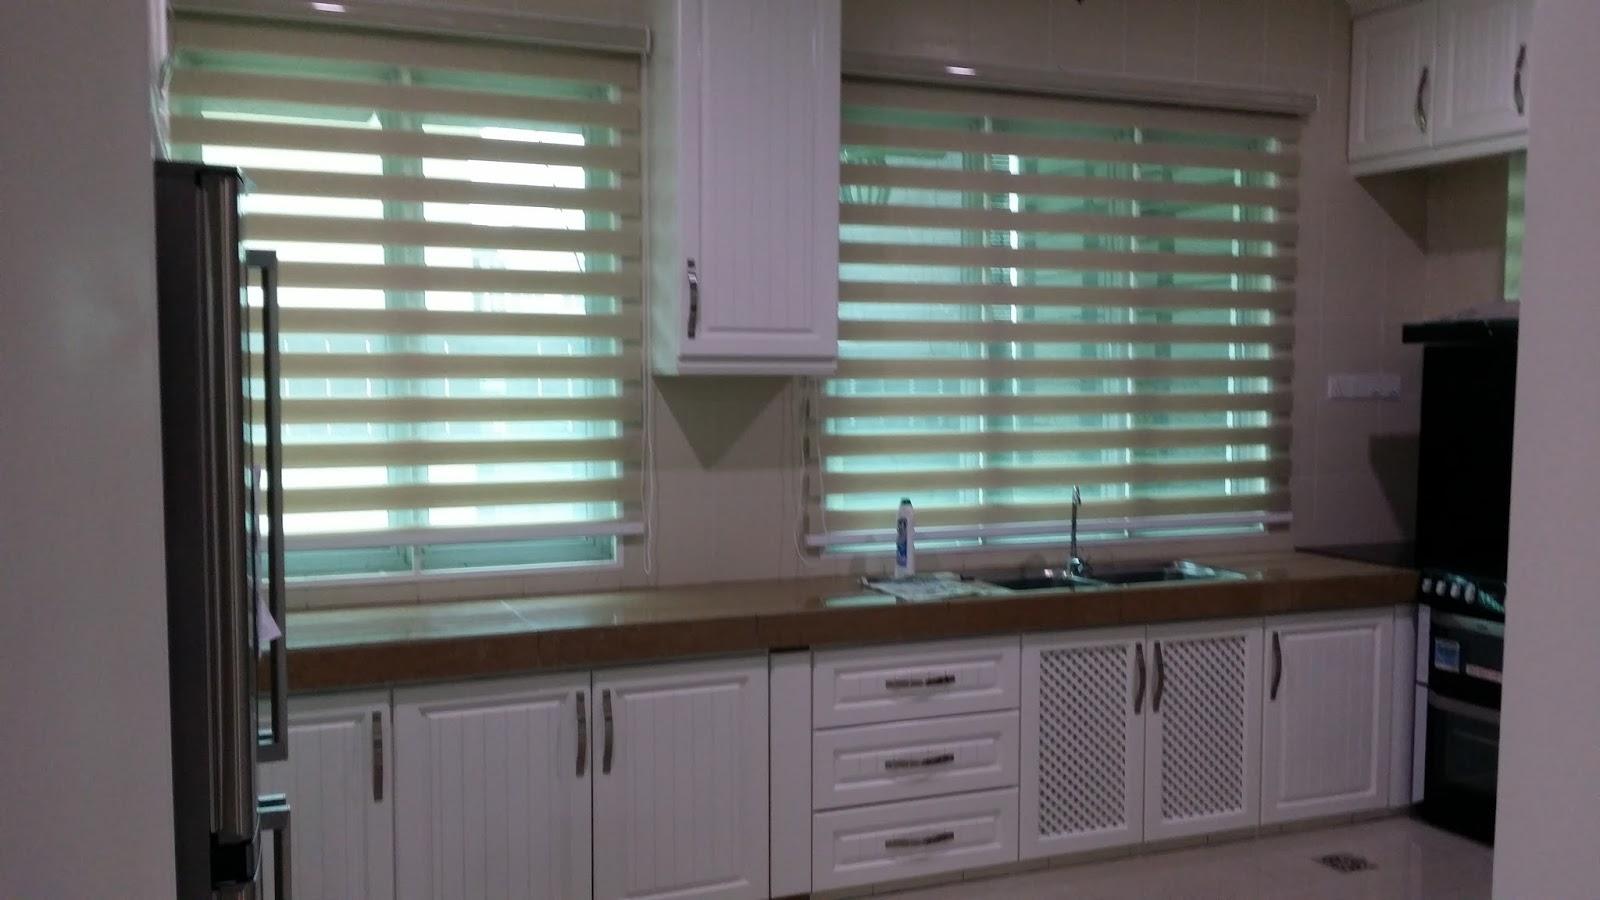 Pemasangan Langsir Di Ruang Keluarga Family Area Zebra Blinds Dapur